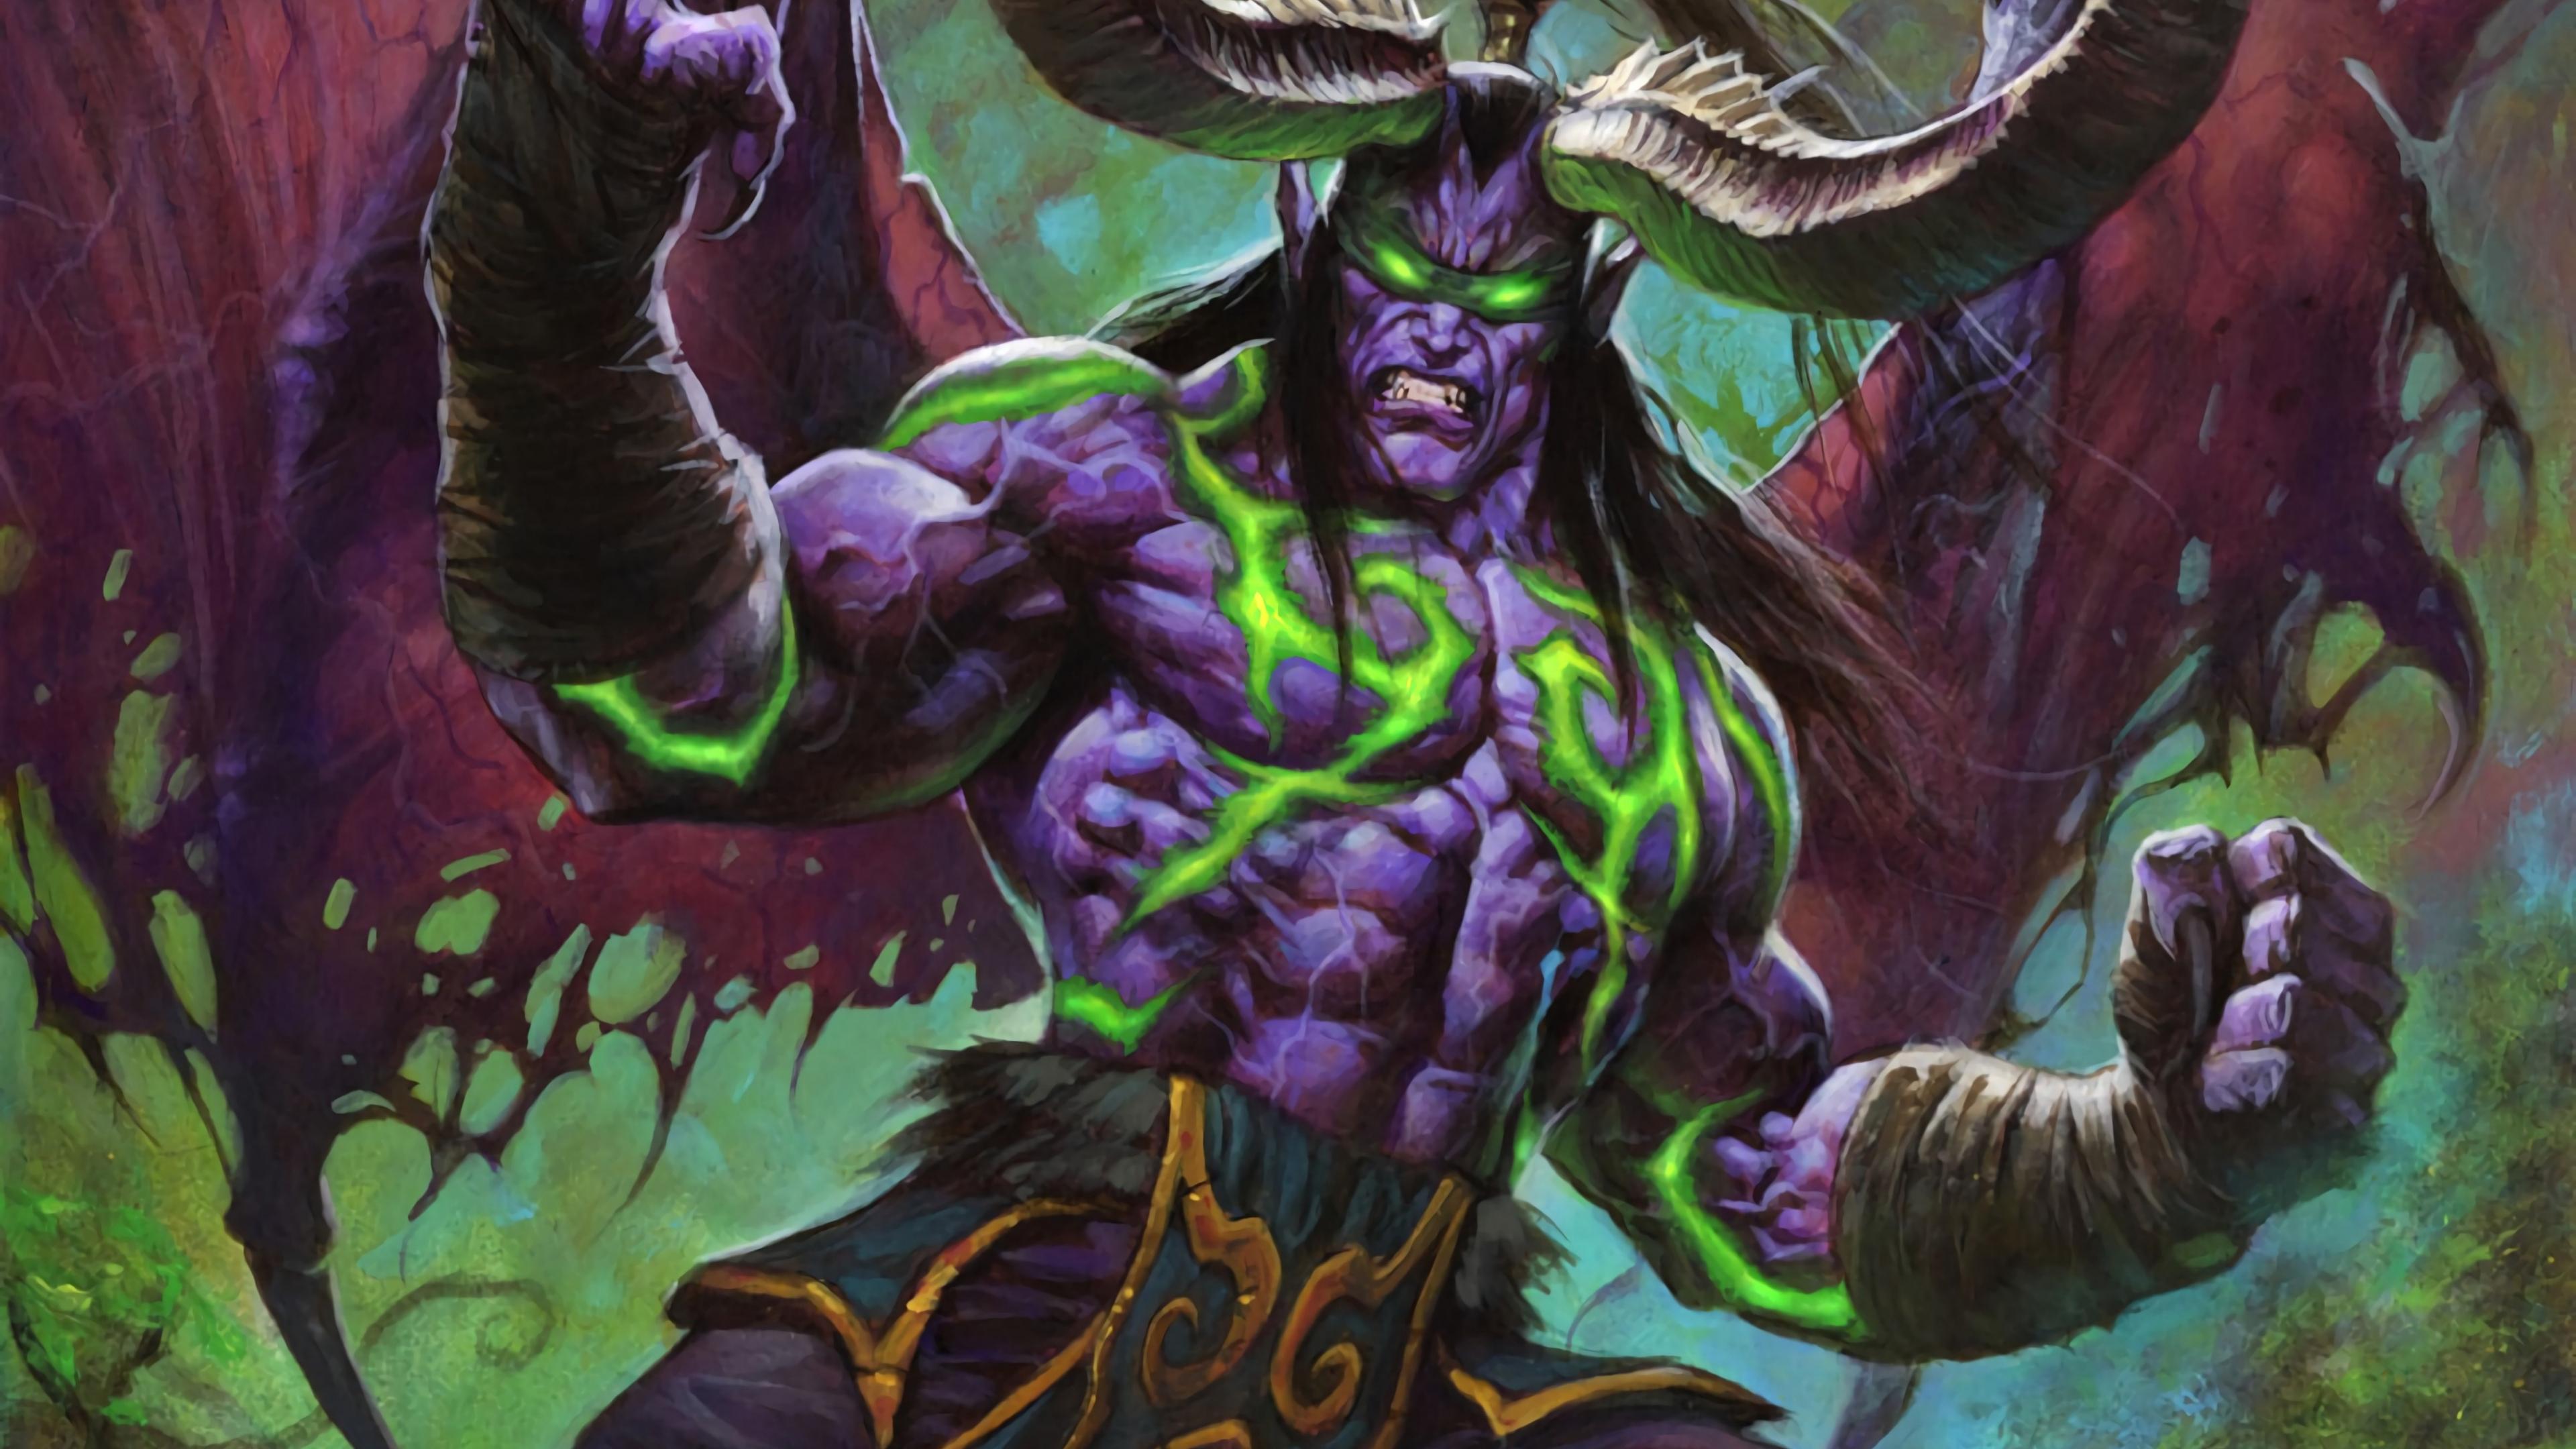 Download 3840x2160 Wallpaper Monster World Of Warcraft